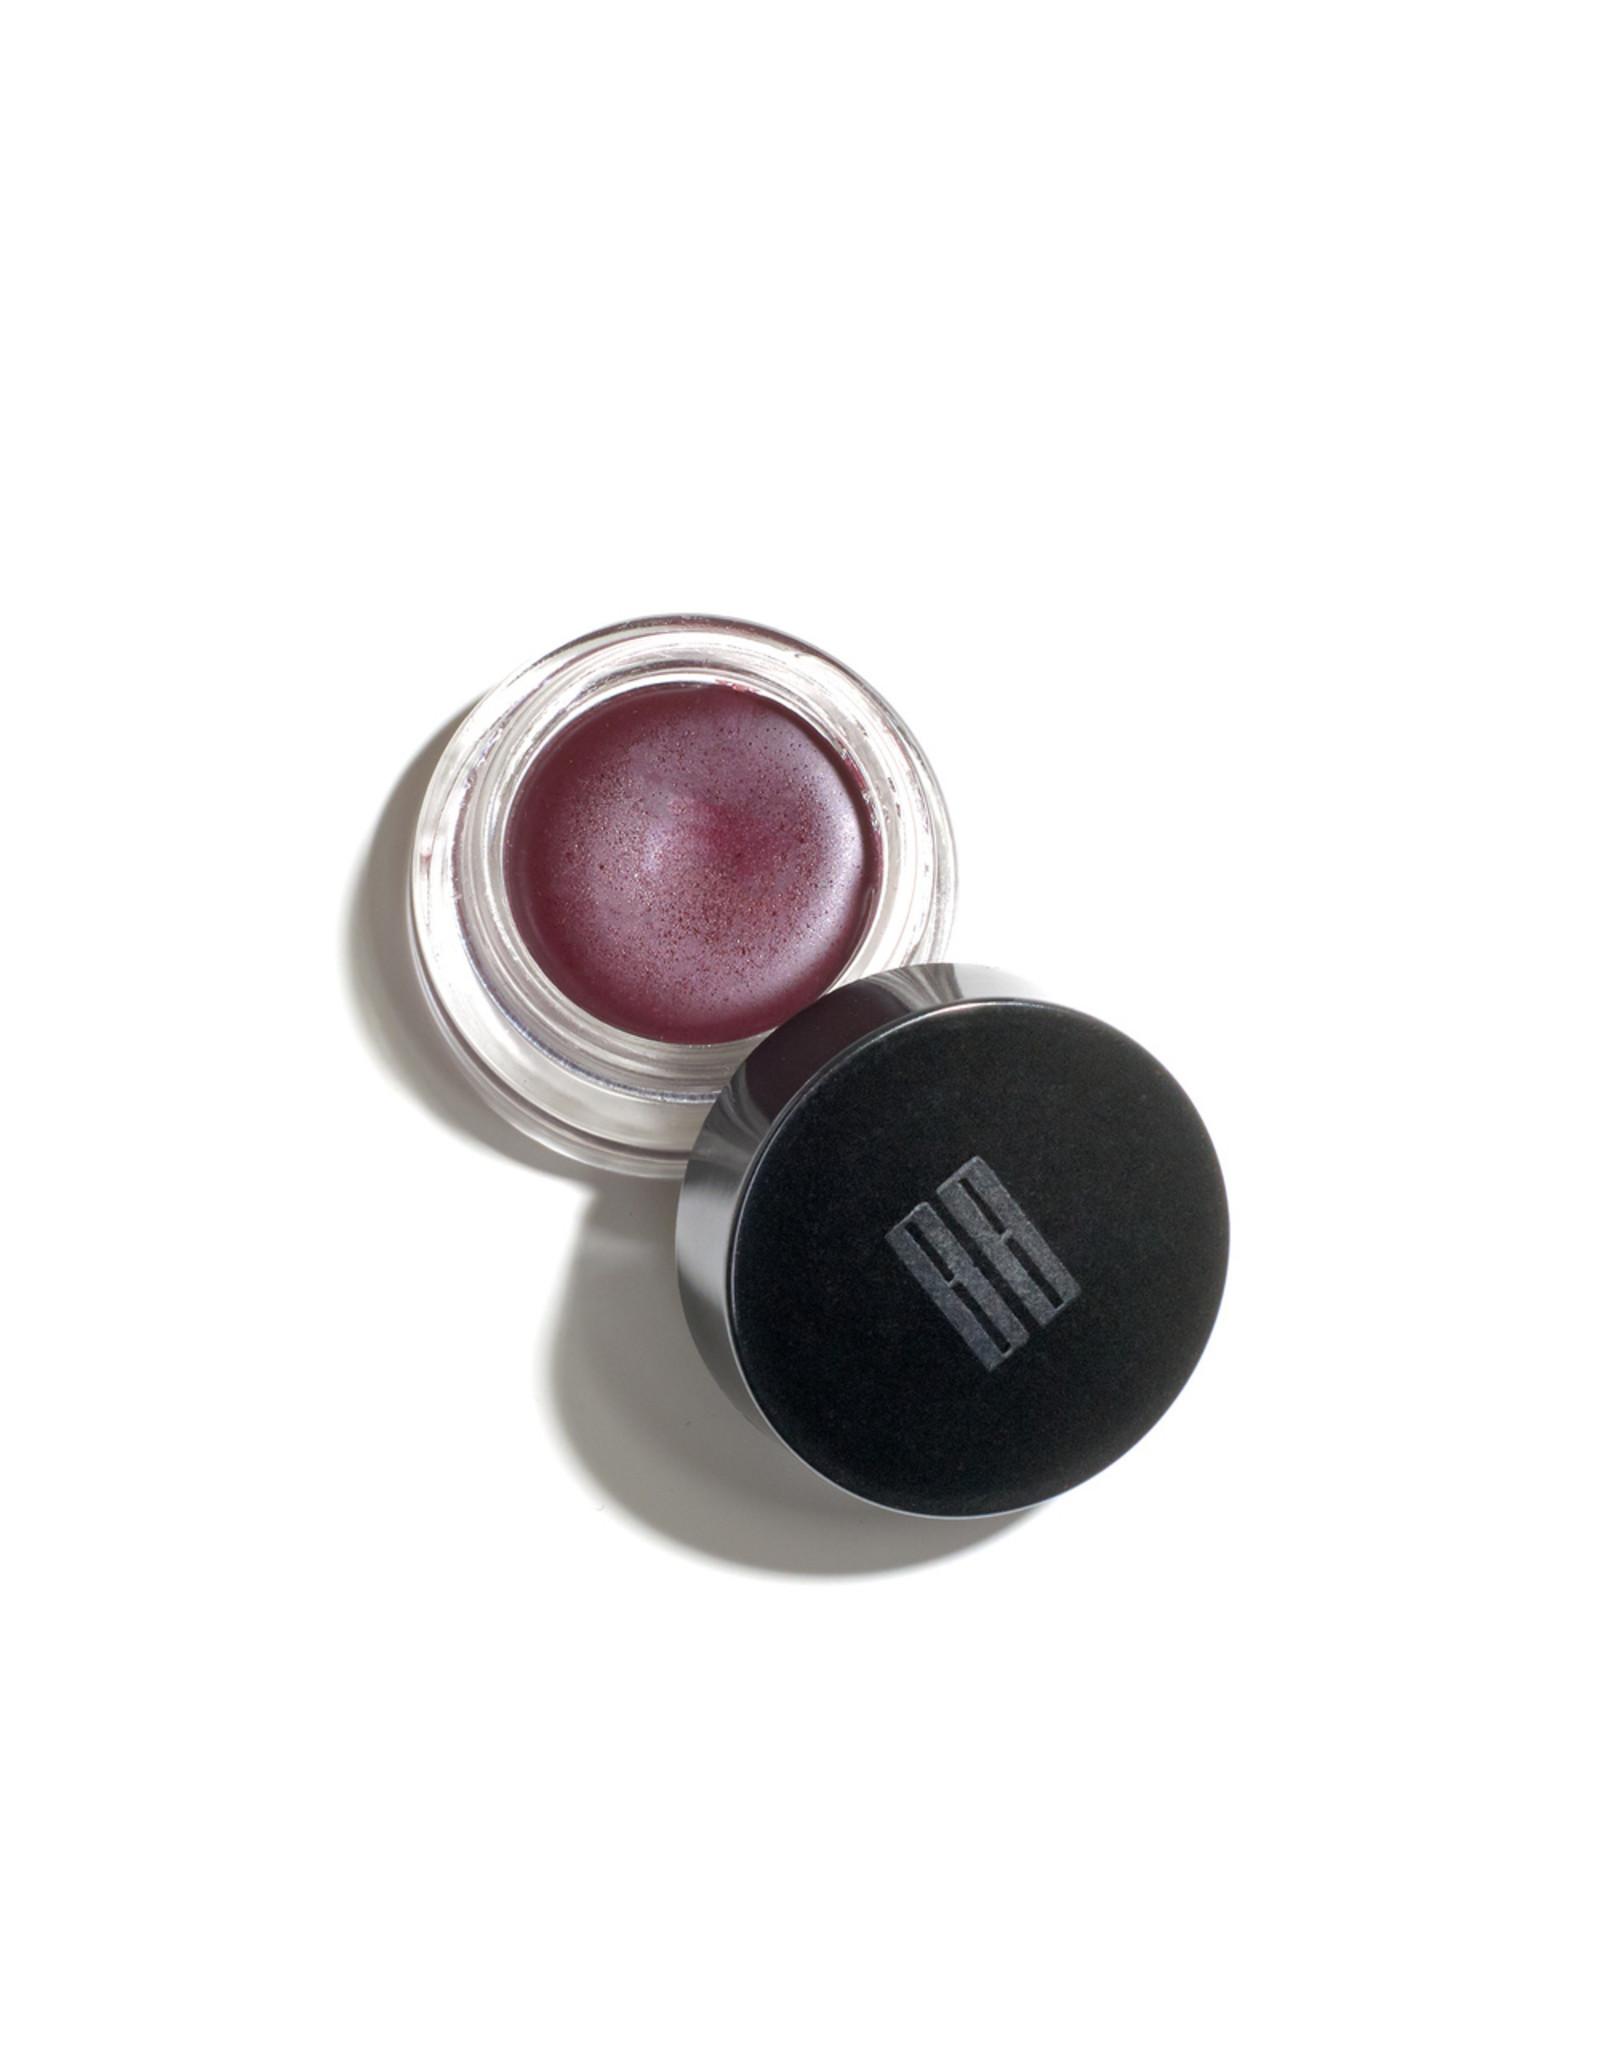 Balmyard Beauty Balmyard Beauty Baby Love Balm Lip + Cheek Tint (Color: Black Roses)